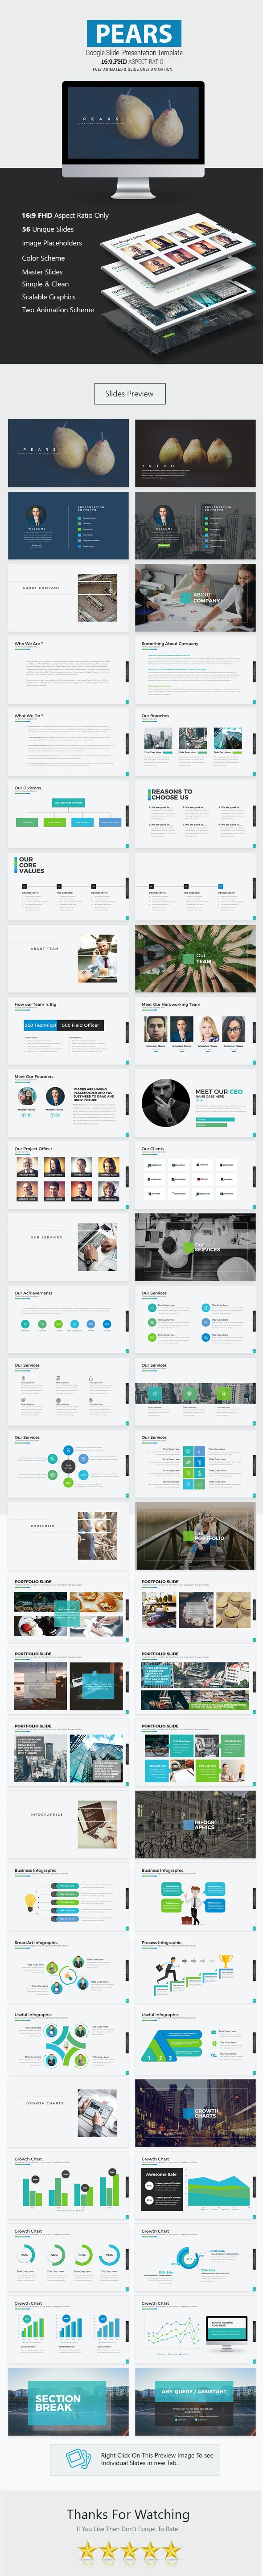 Pears Google Slide Presentation Template - Business PowerPoint Templates